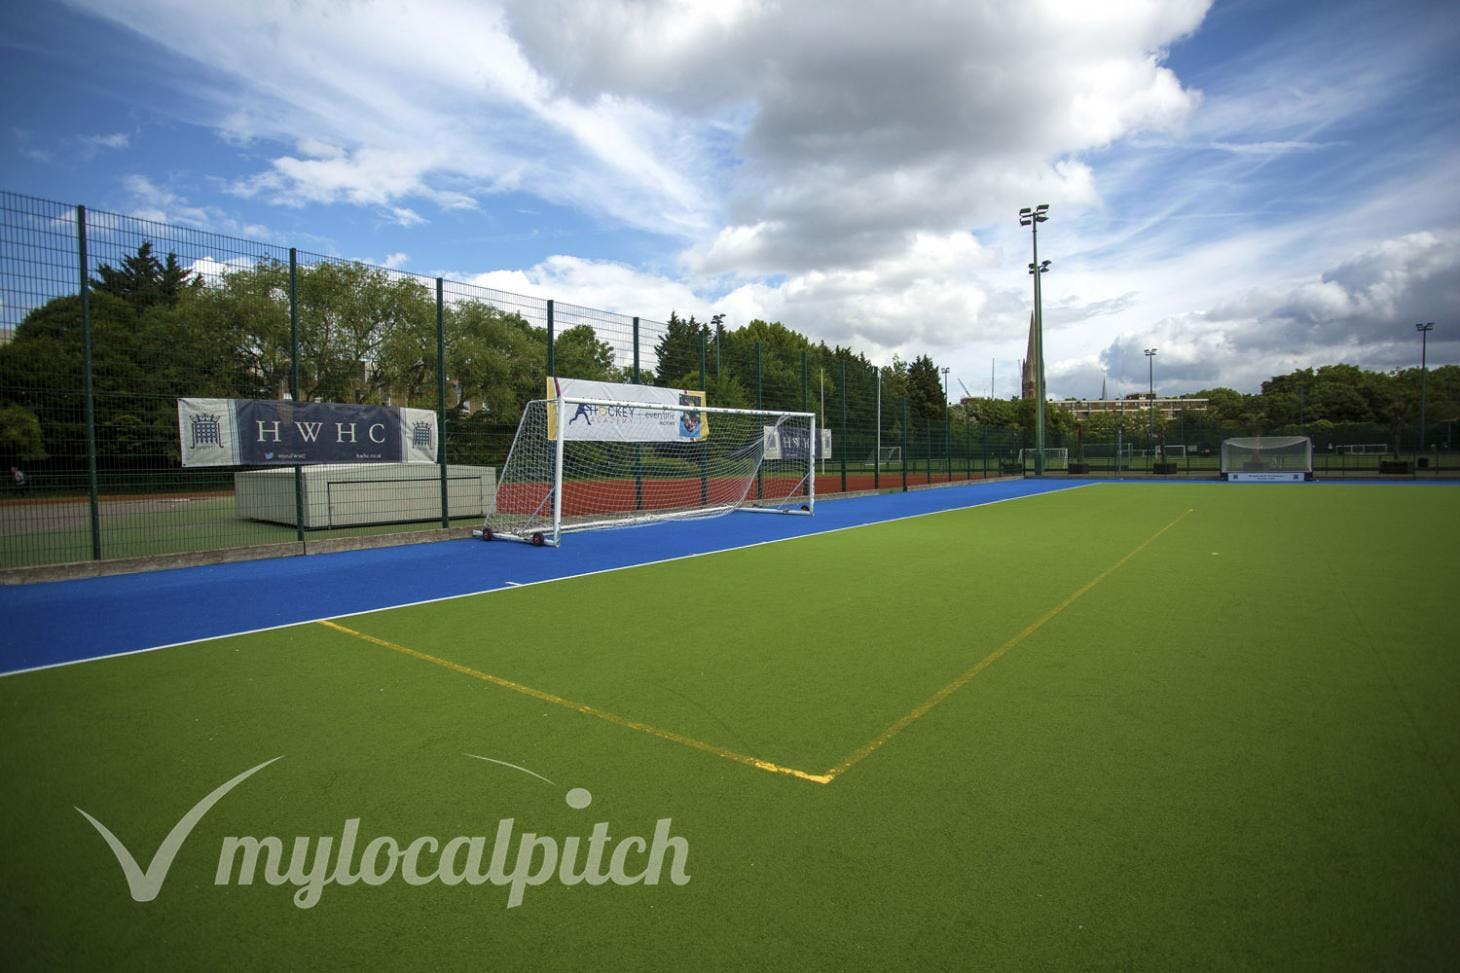 Paddington Recreation Ground 11 a side   Astroturf football pitch